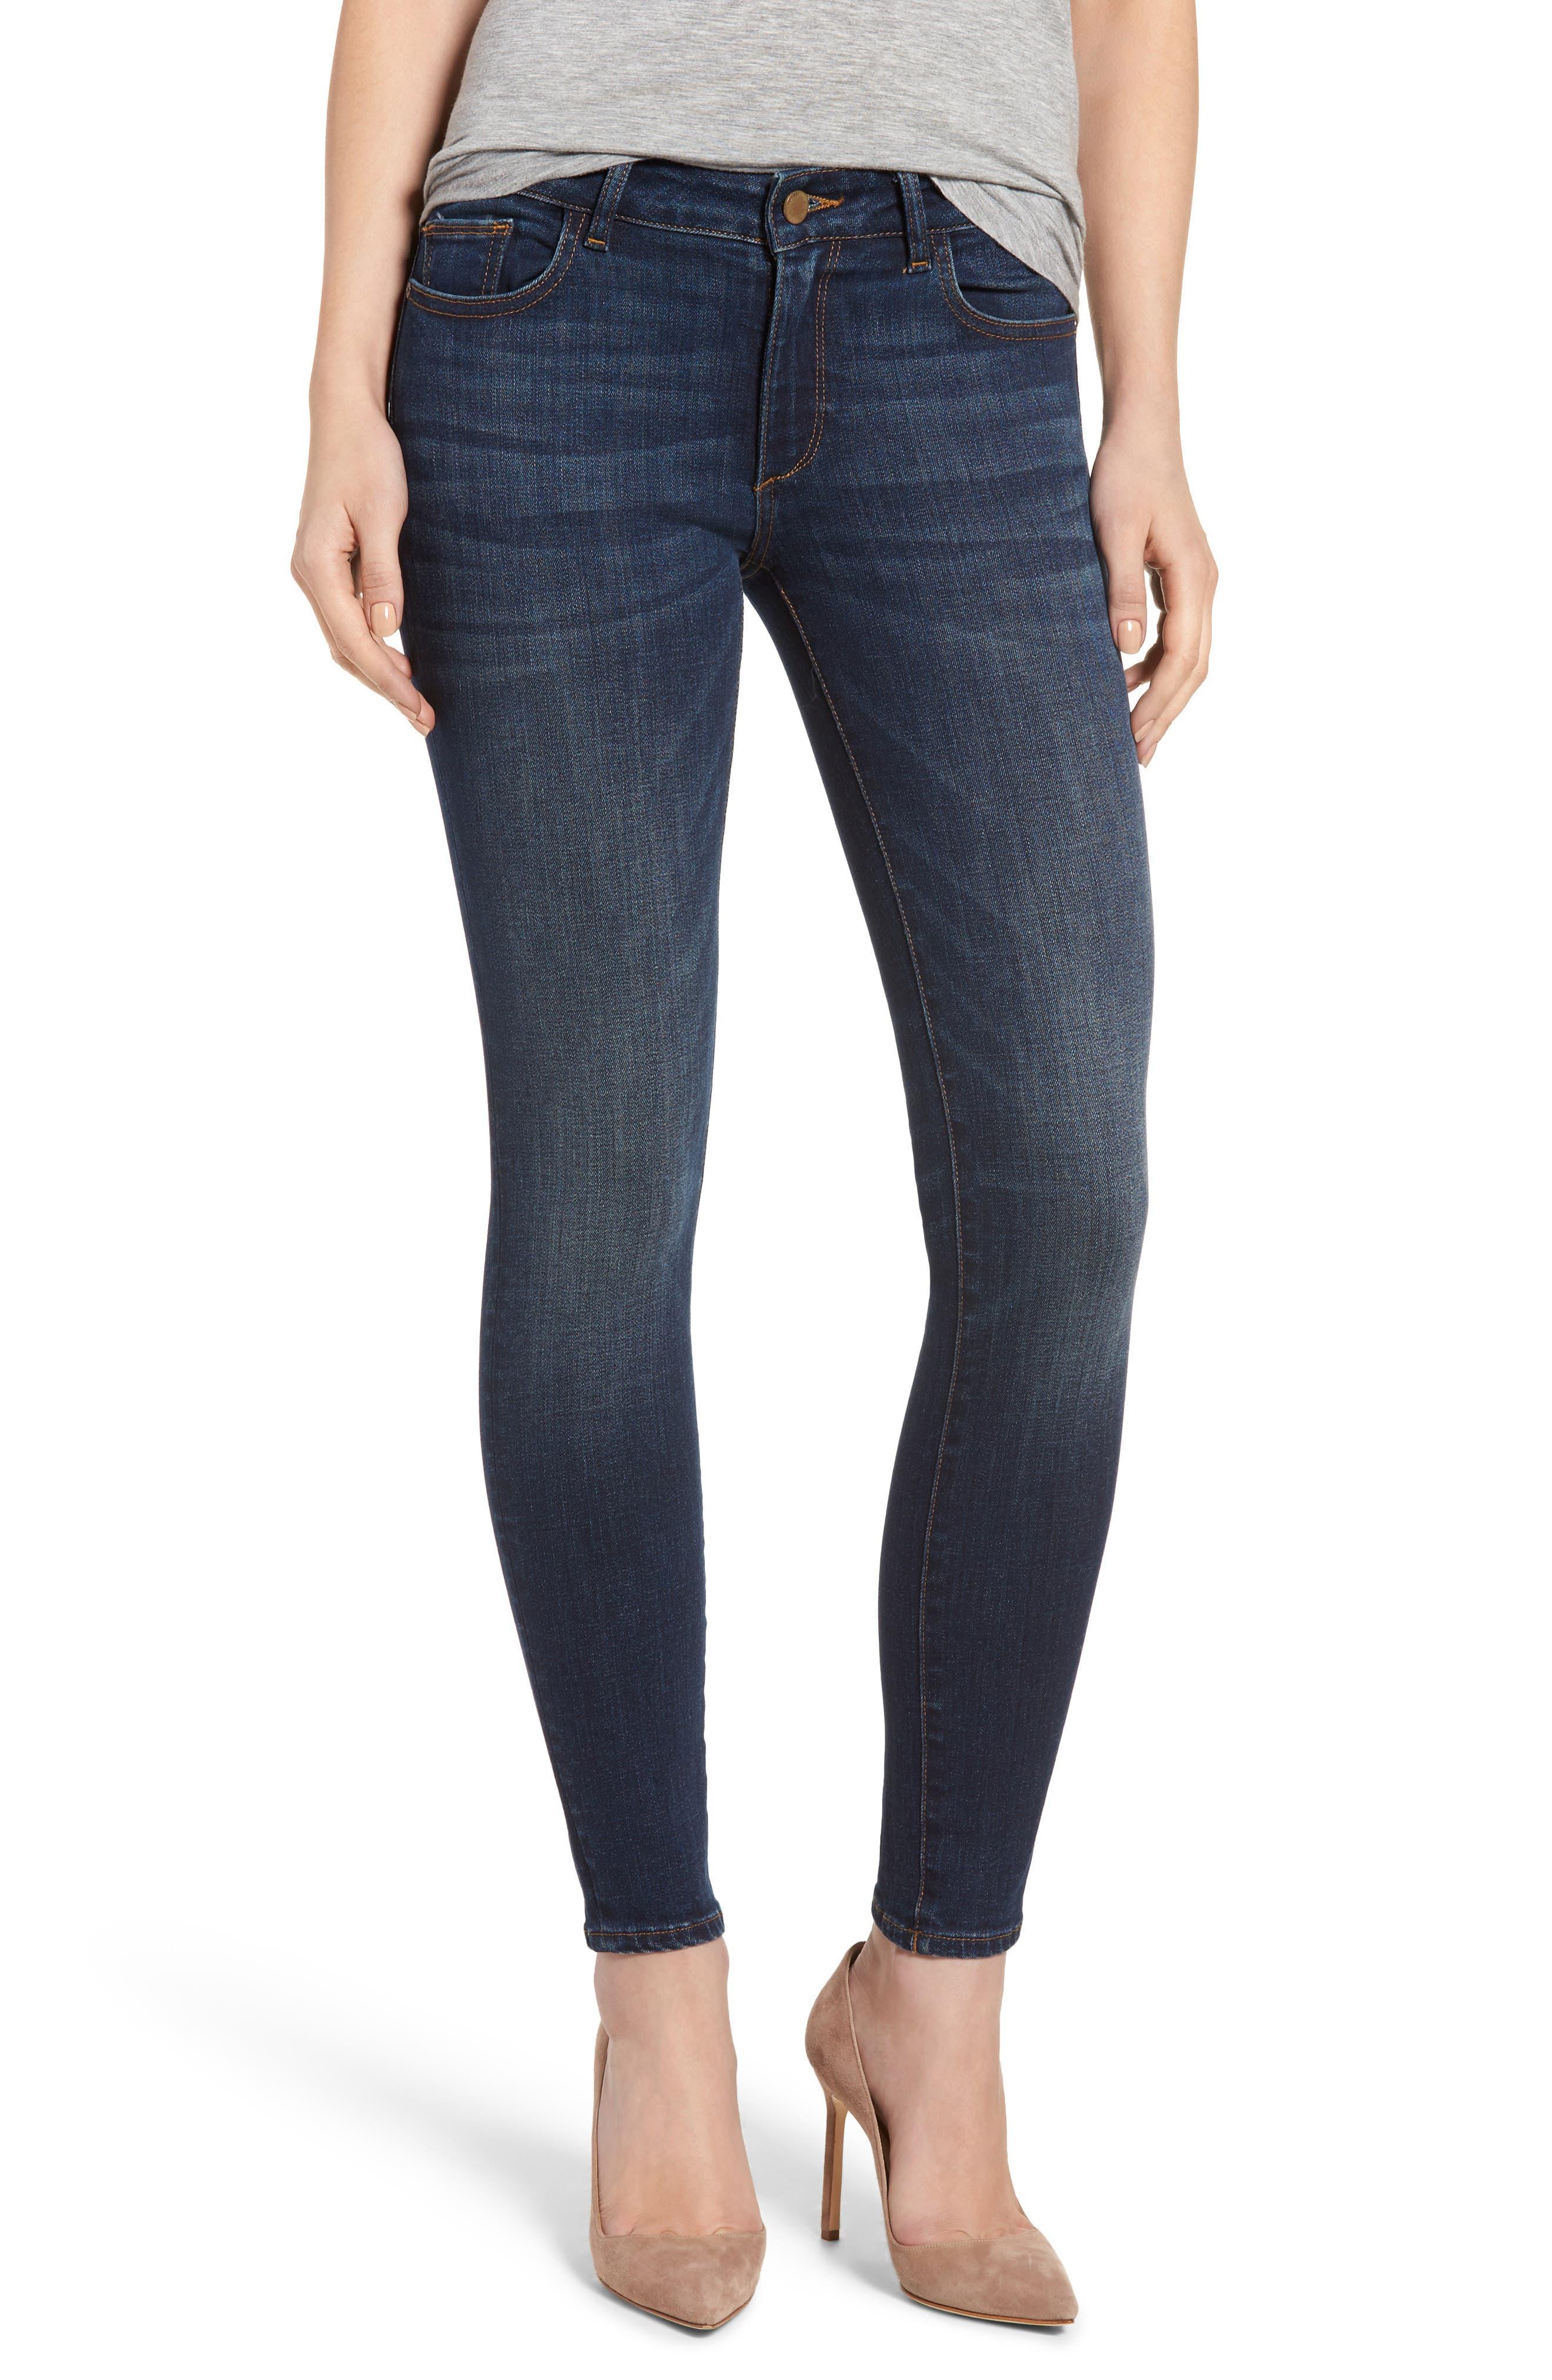 Emma Power Legging Skinny Jeans,                         Main,                         color, SULTON